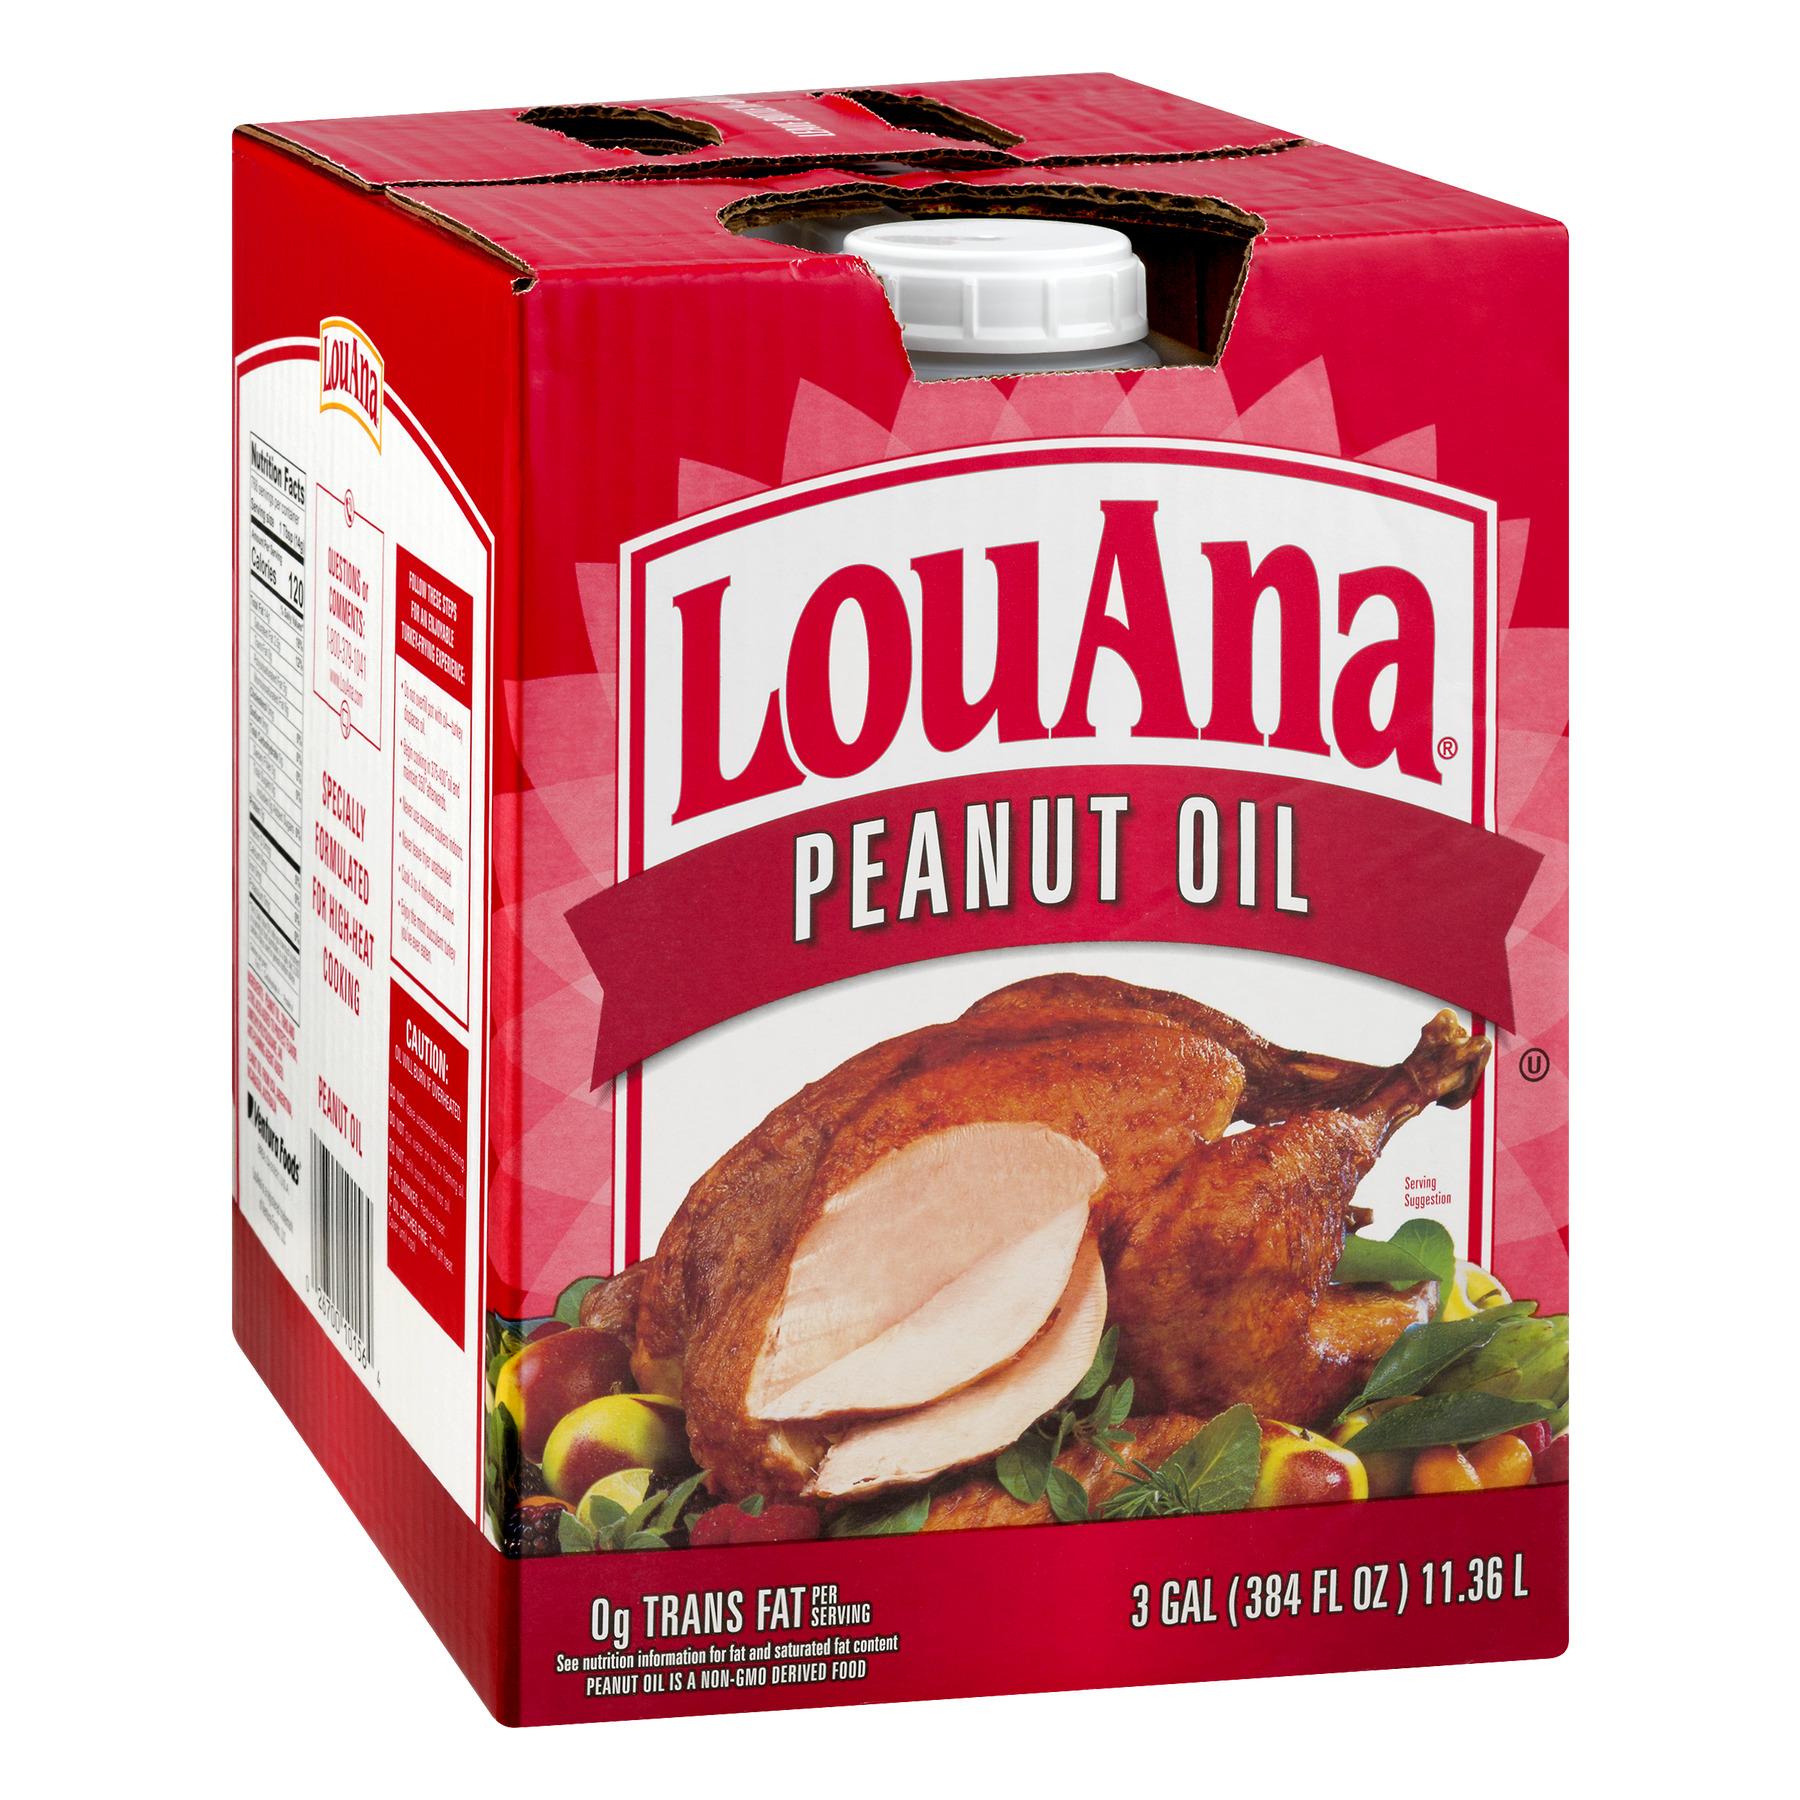 LouAna Peanut Oil, 3 Gallon